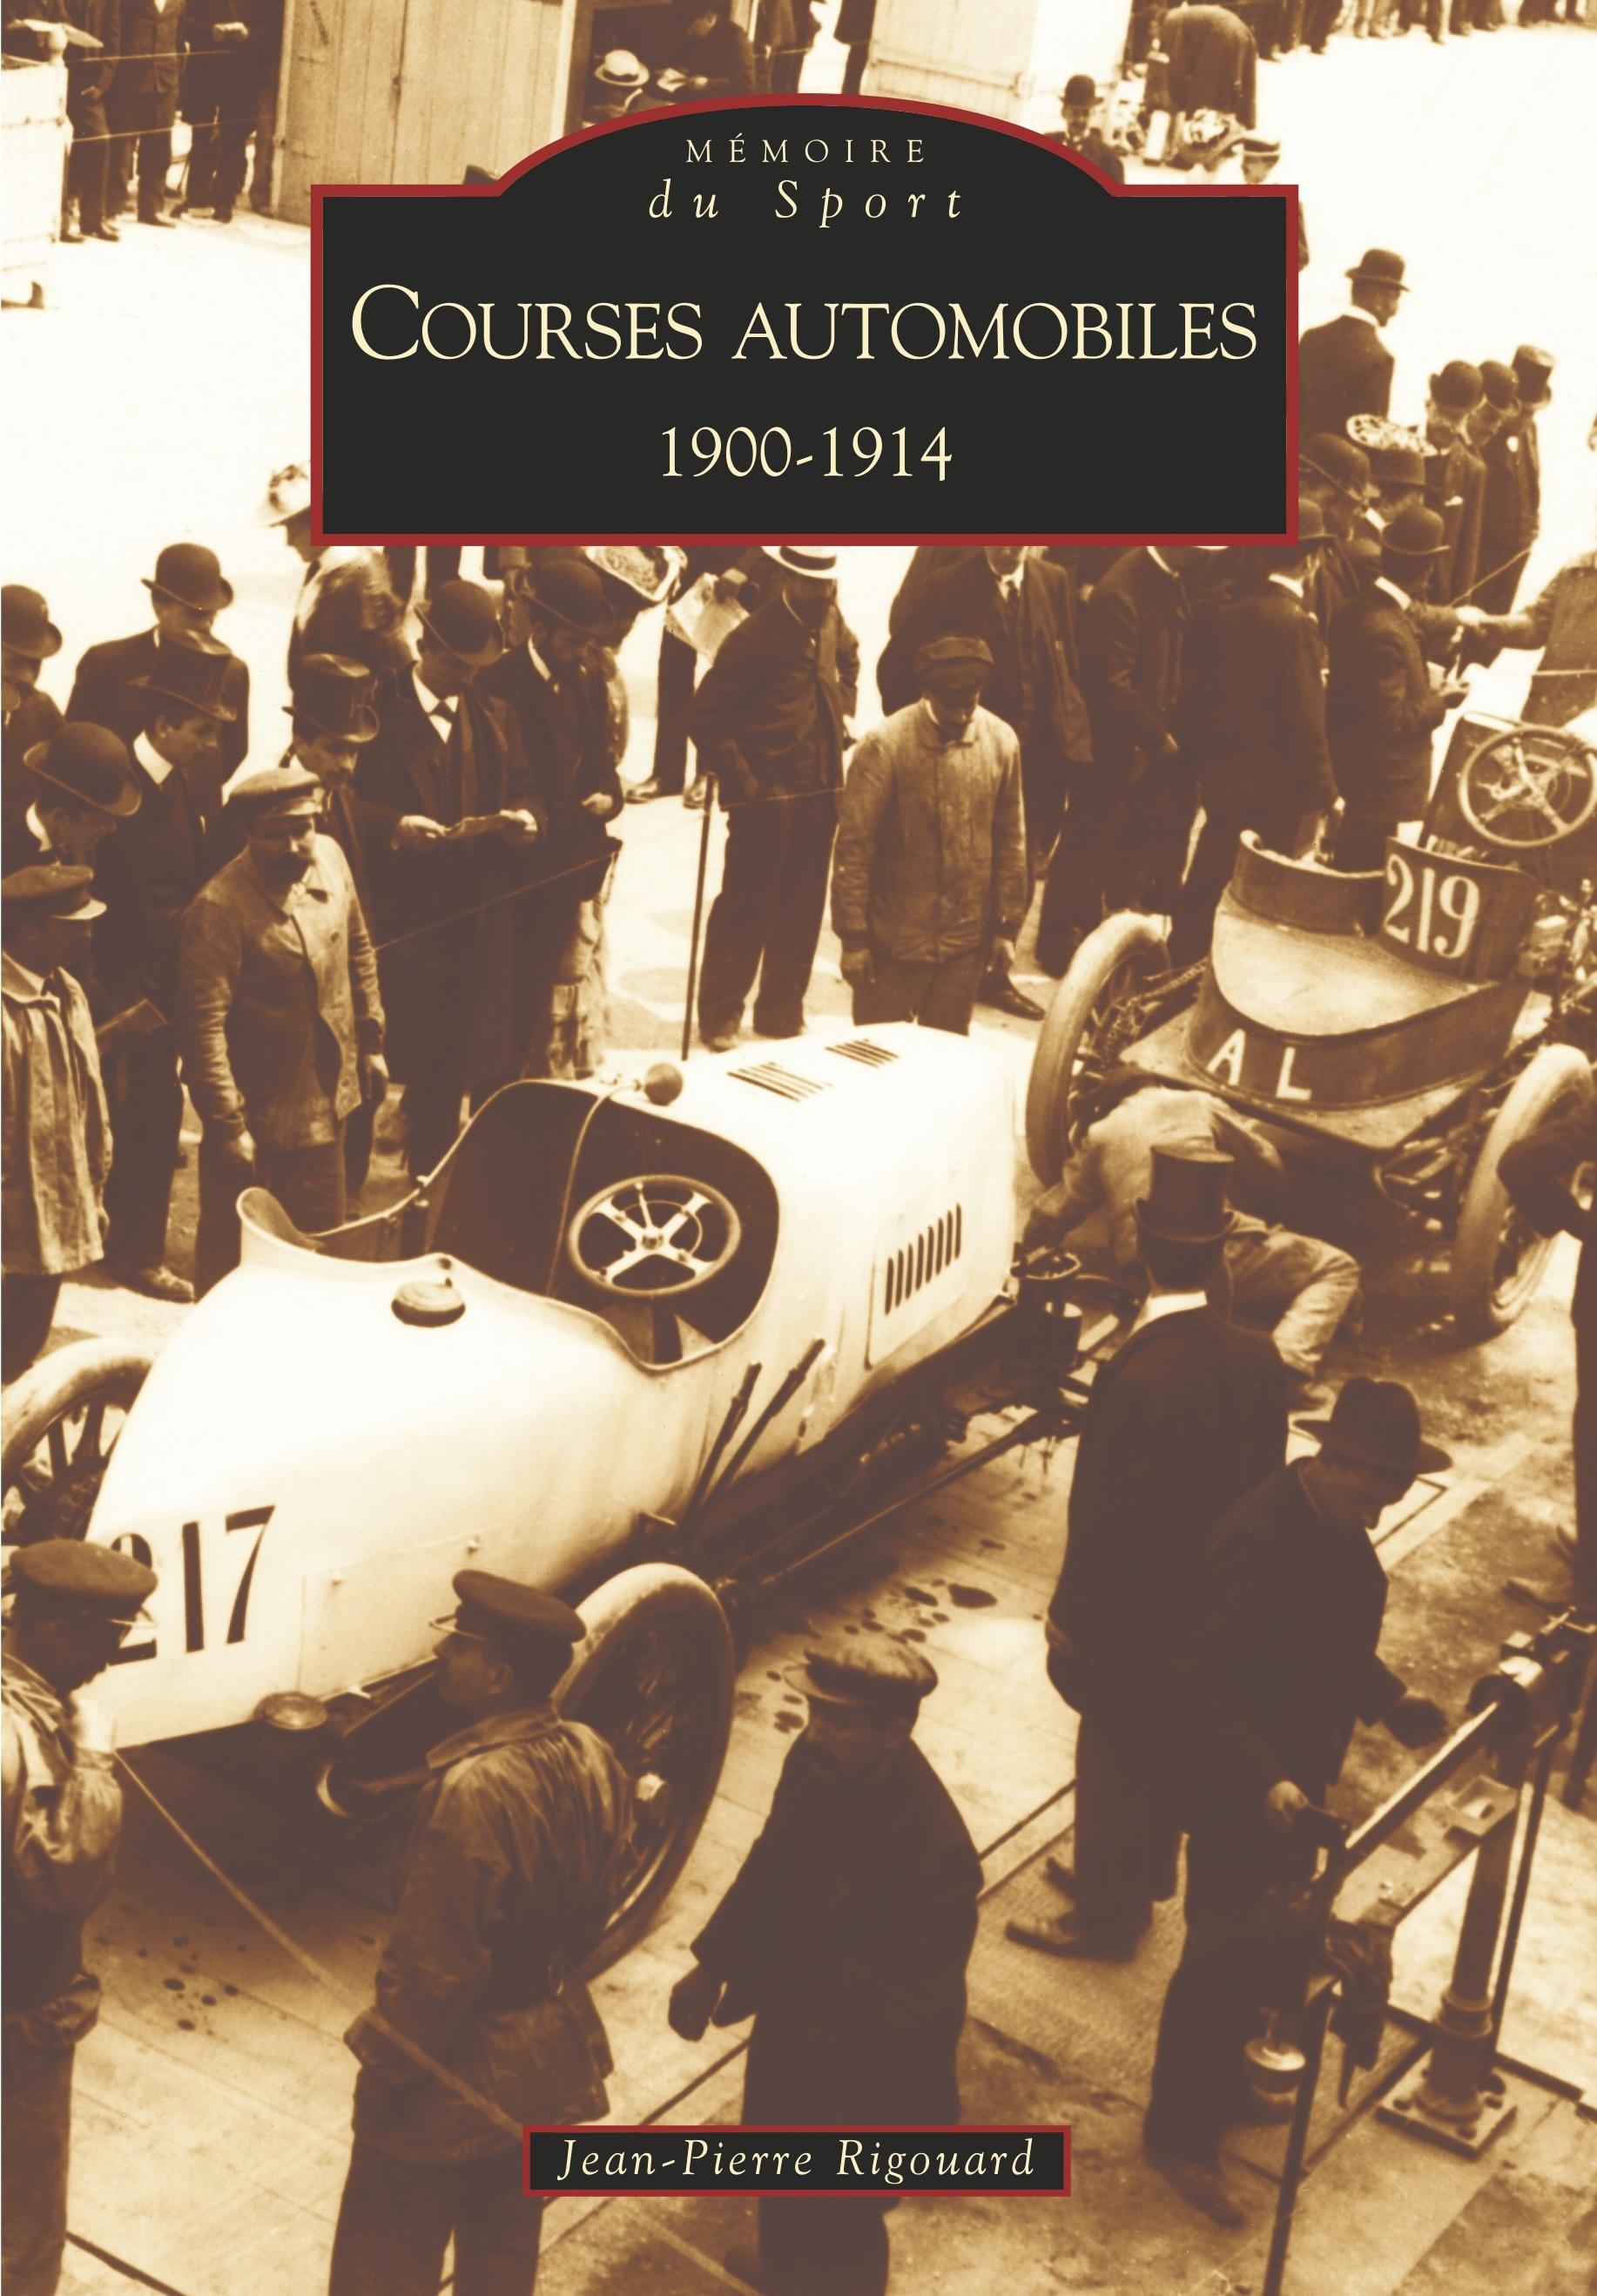 COURSES AUTOMOBILES 1900-1914